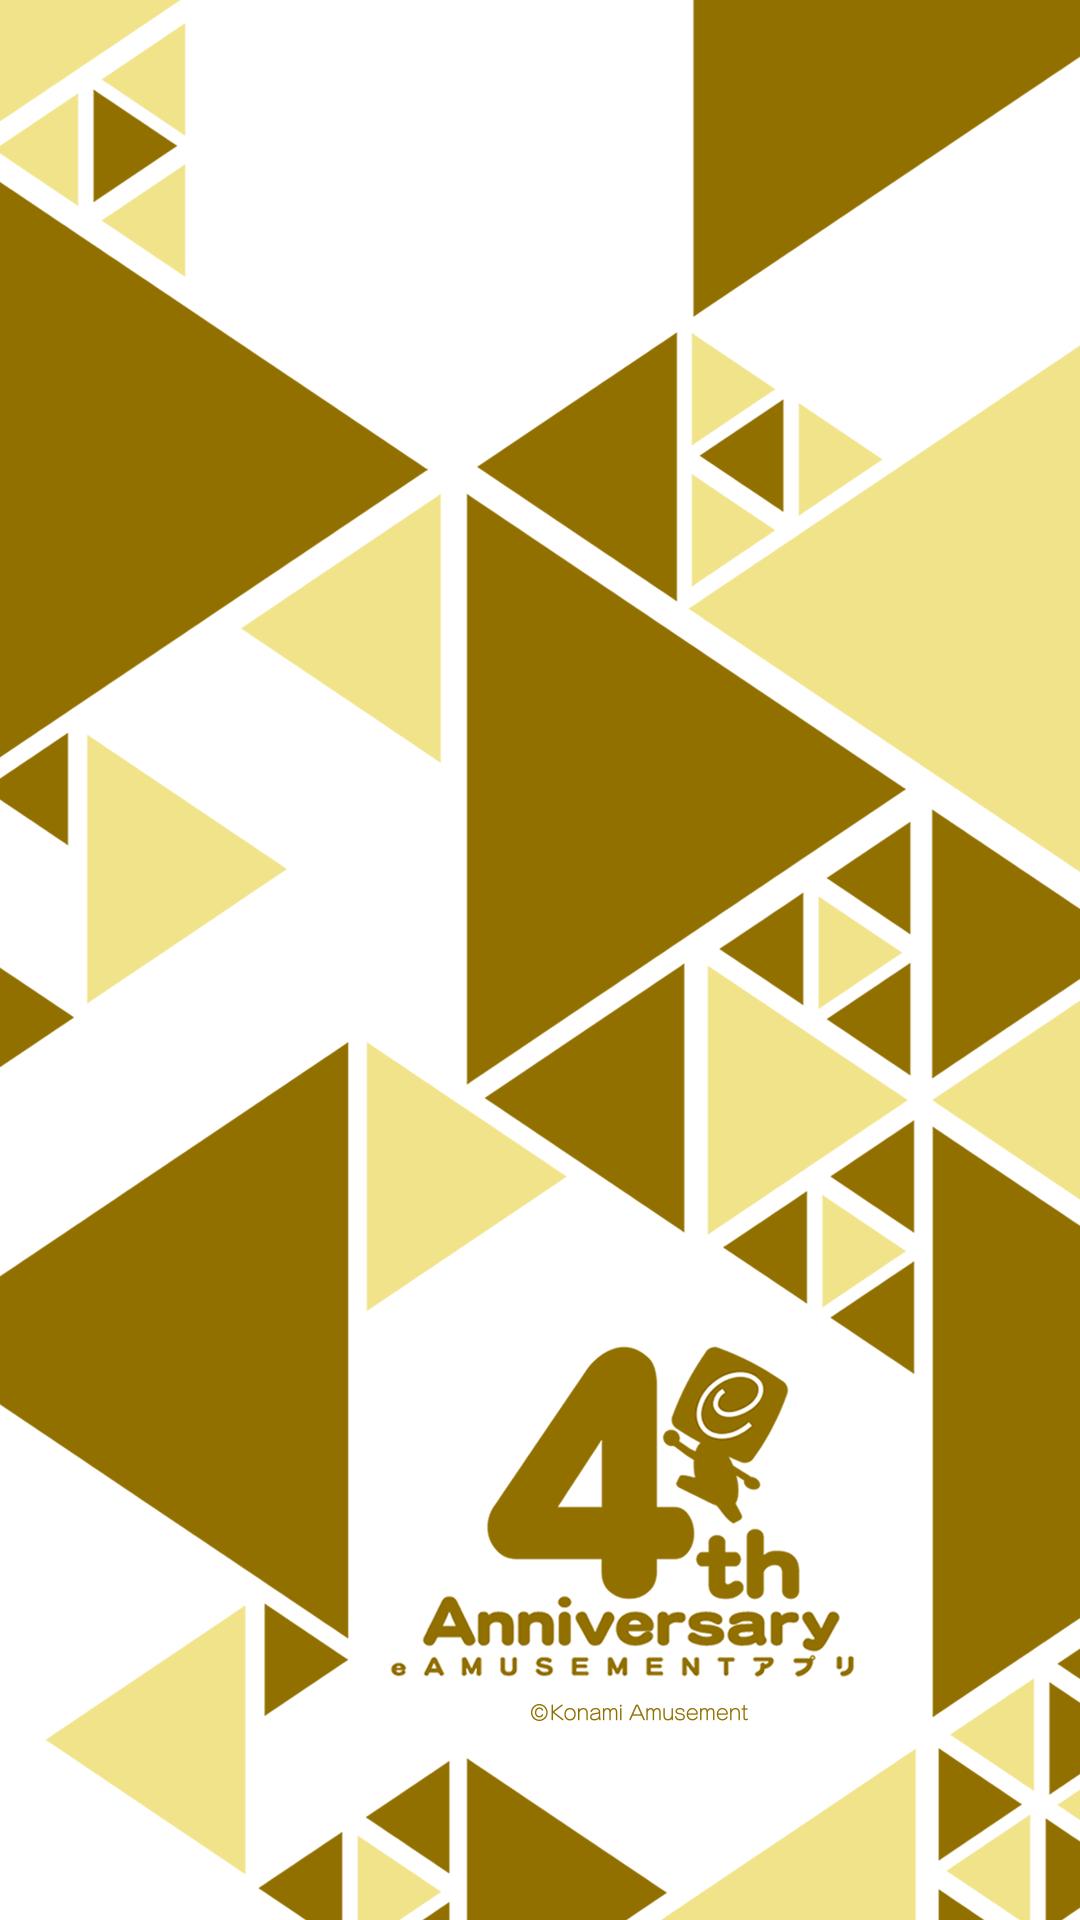 E Amusementアプリ4周年記念壁紙 配信ページ E Amusementアプリ4